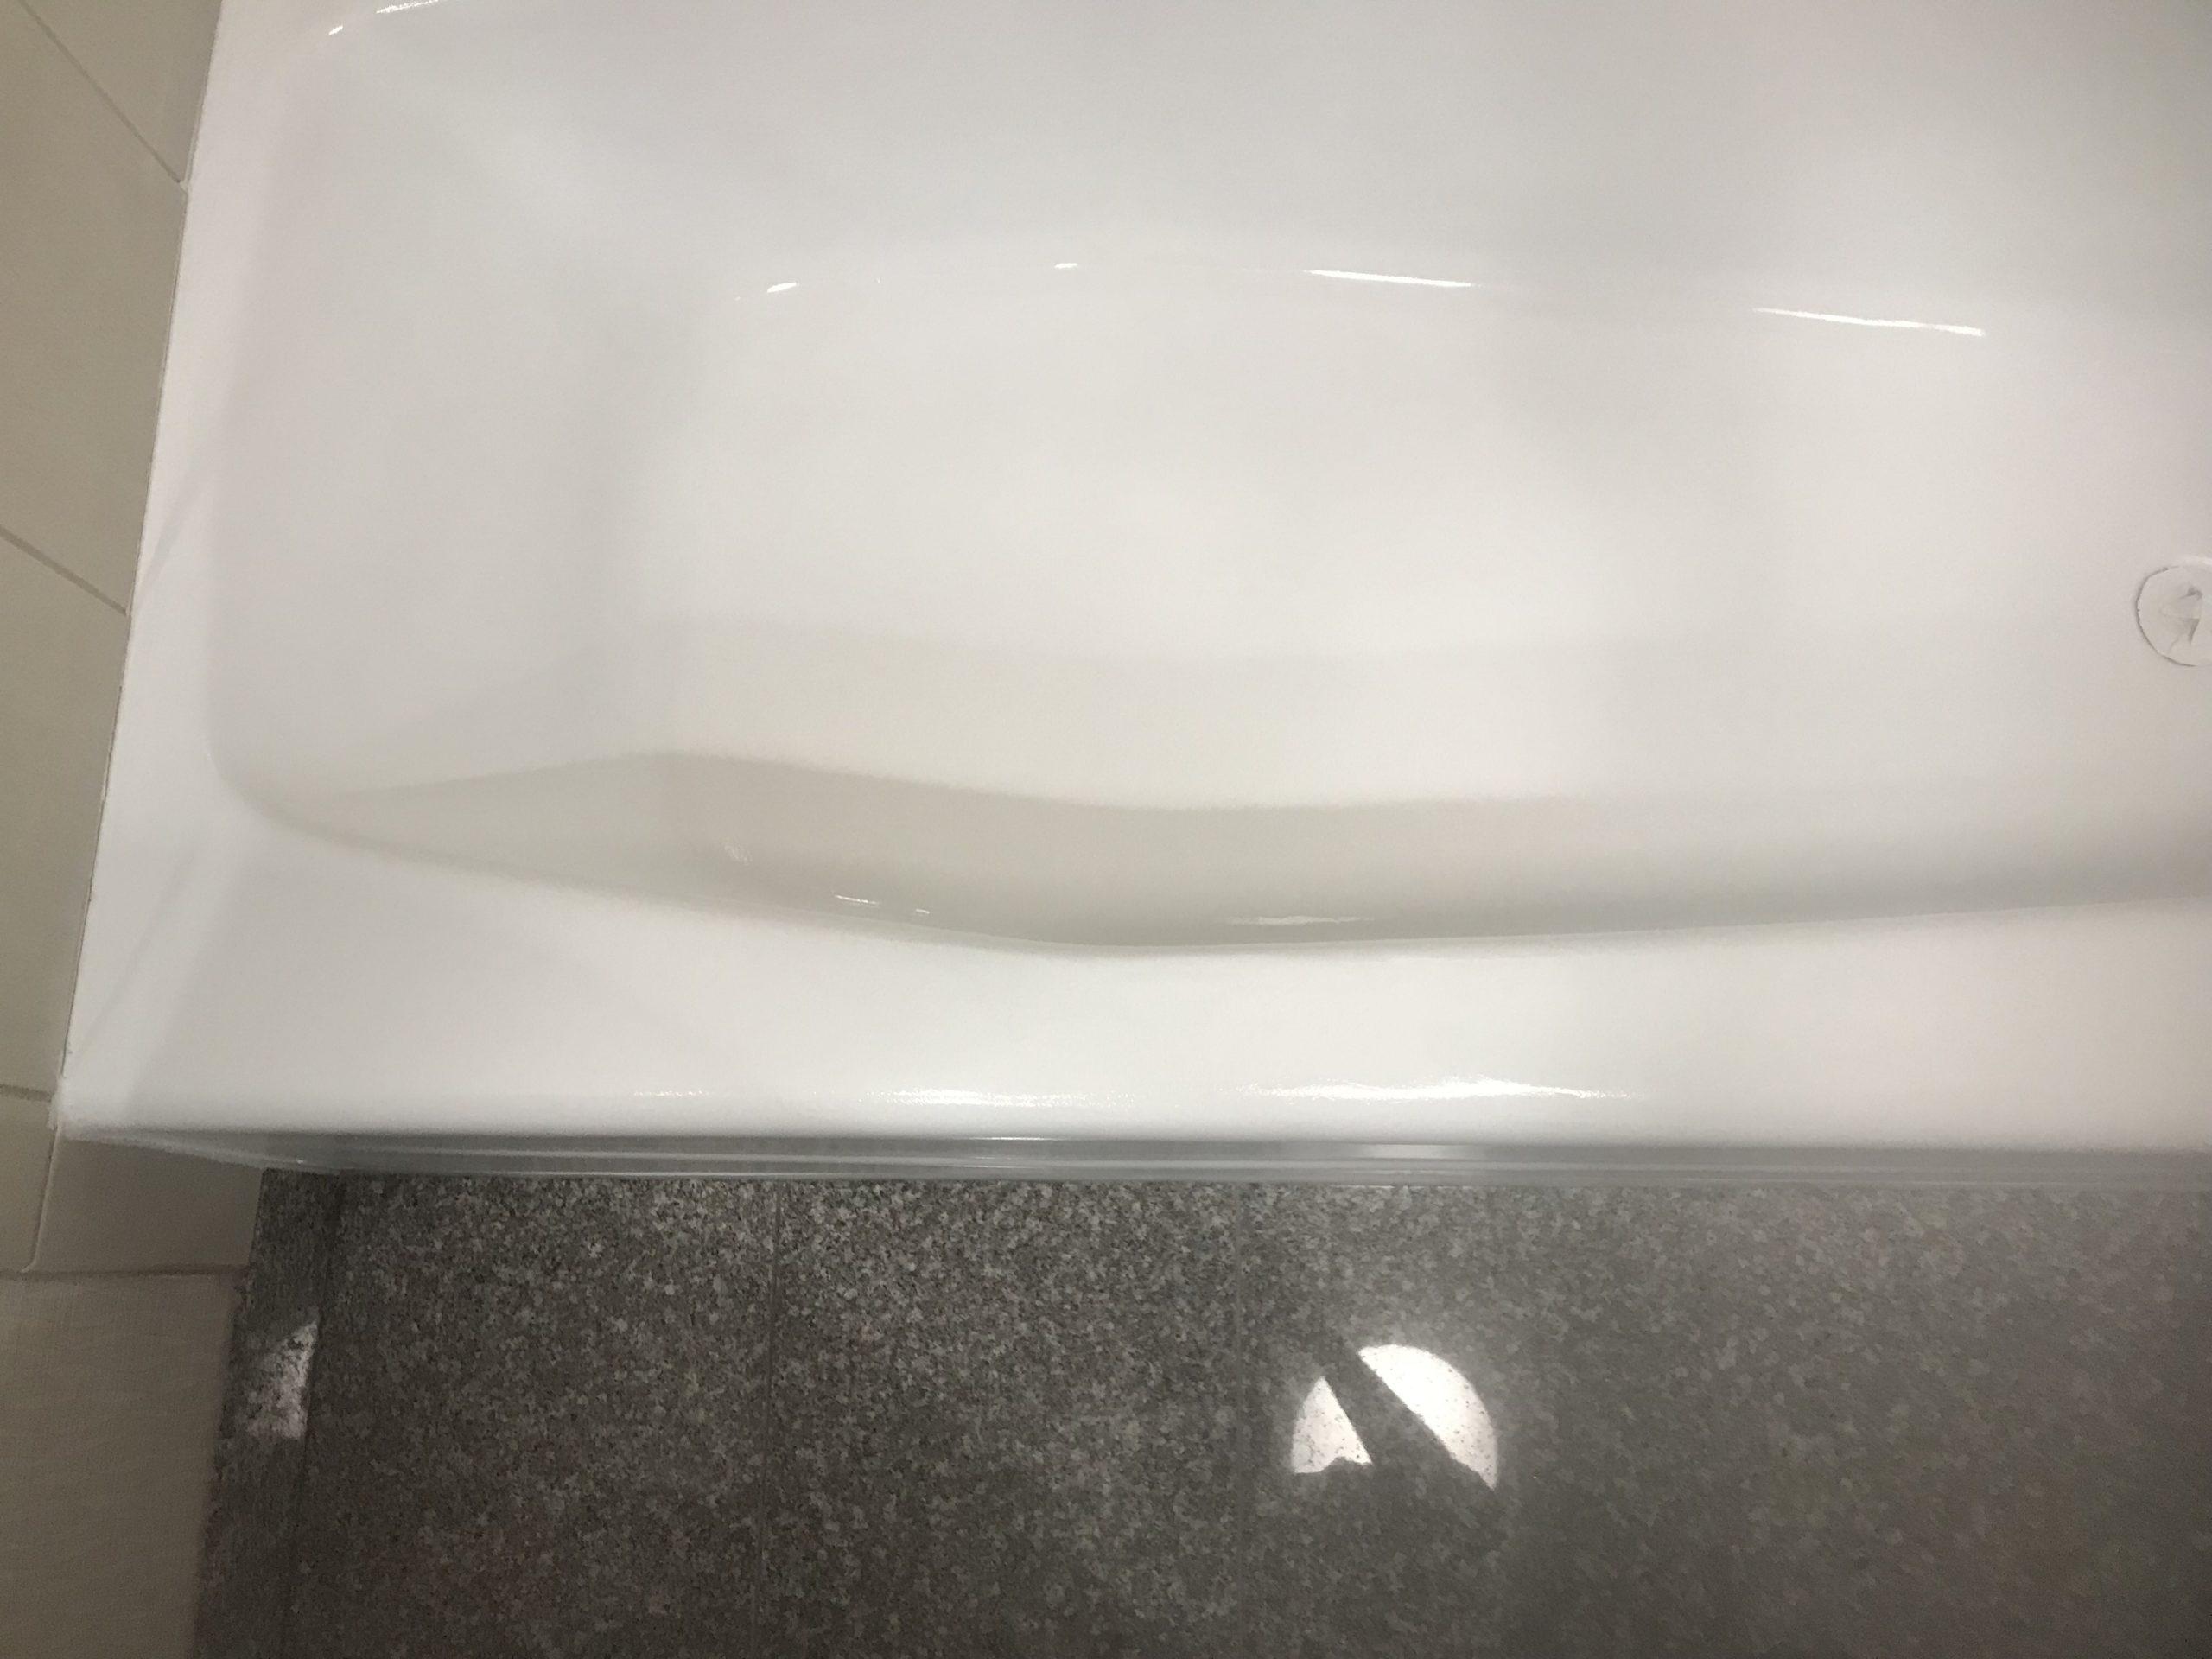 tub appears like new